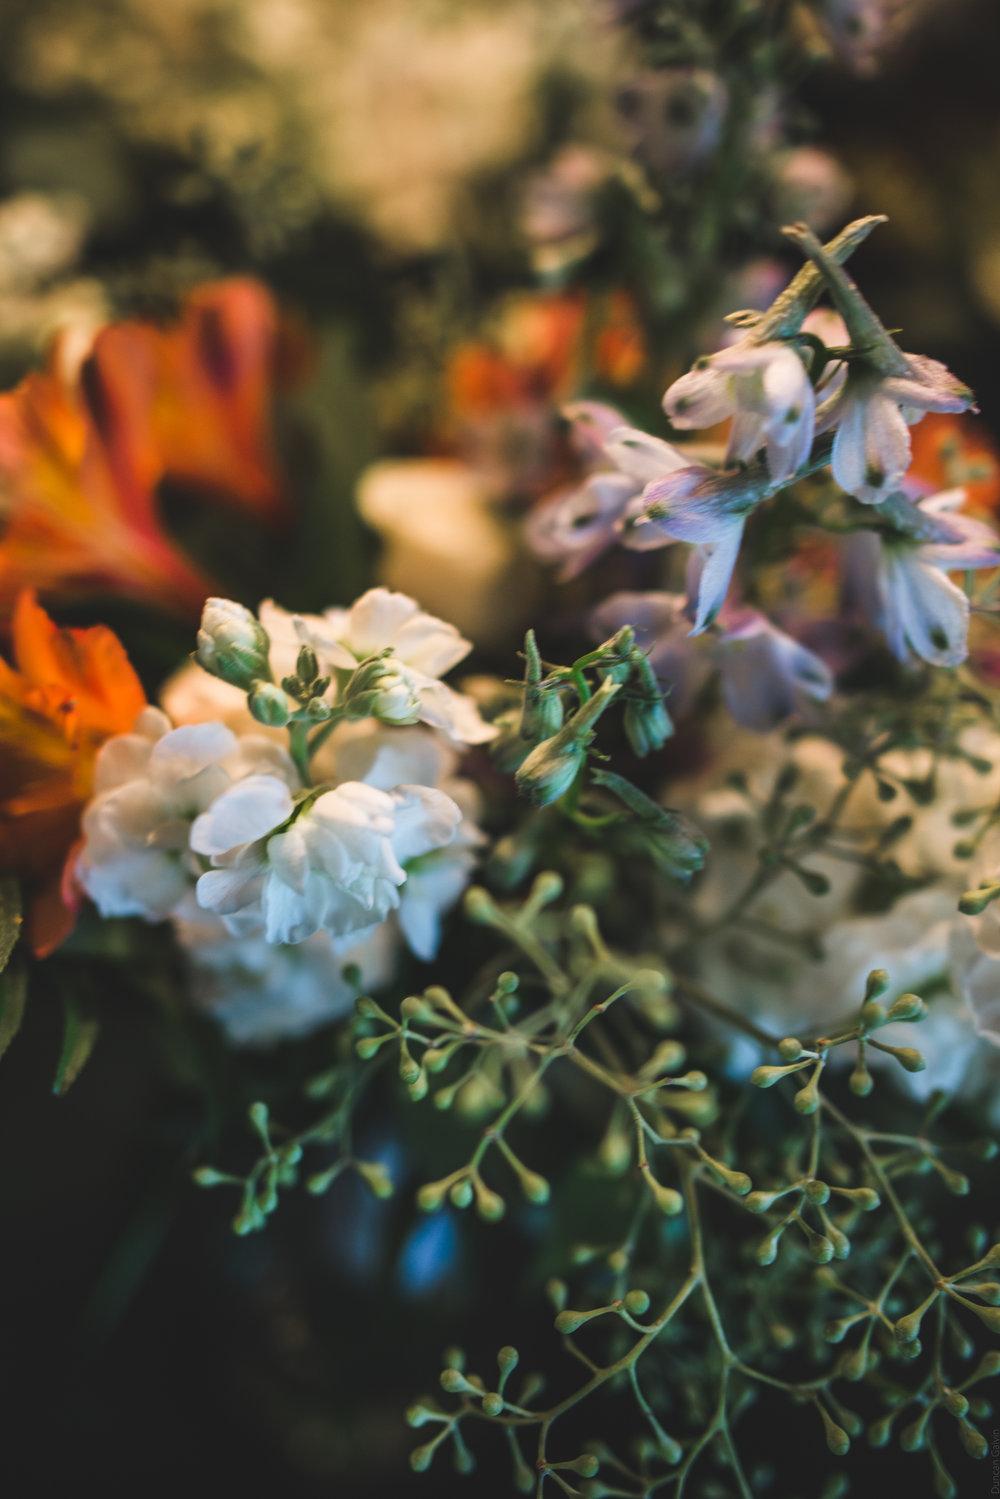 Lana Micah Wedding Pre Ceremony La Grande Oregon September 2018 Please Credit Talia Jean Galvin (107 of 144).jpg